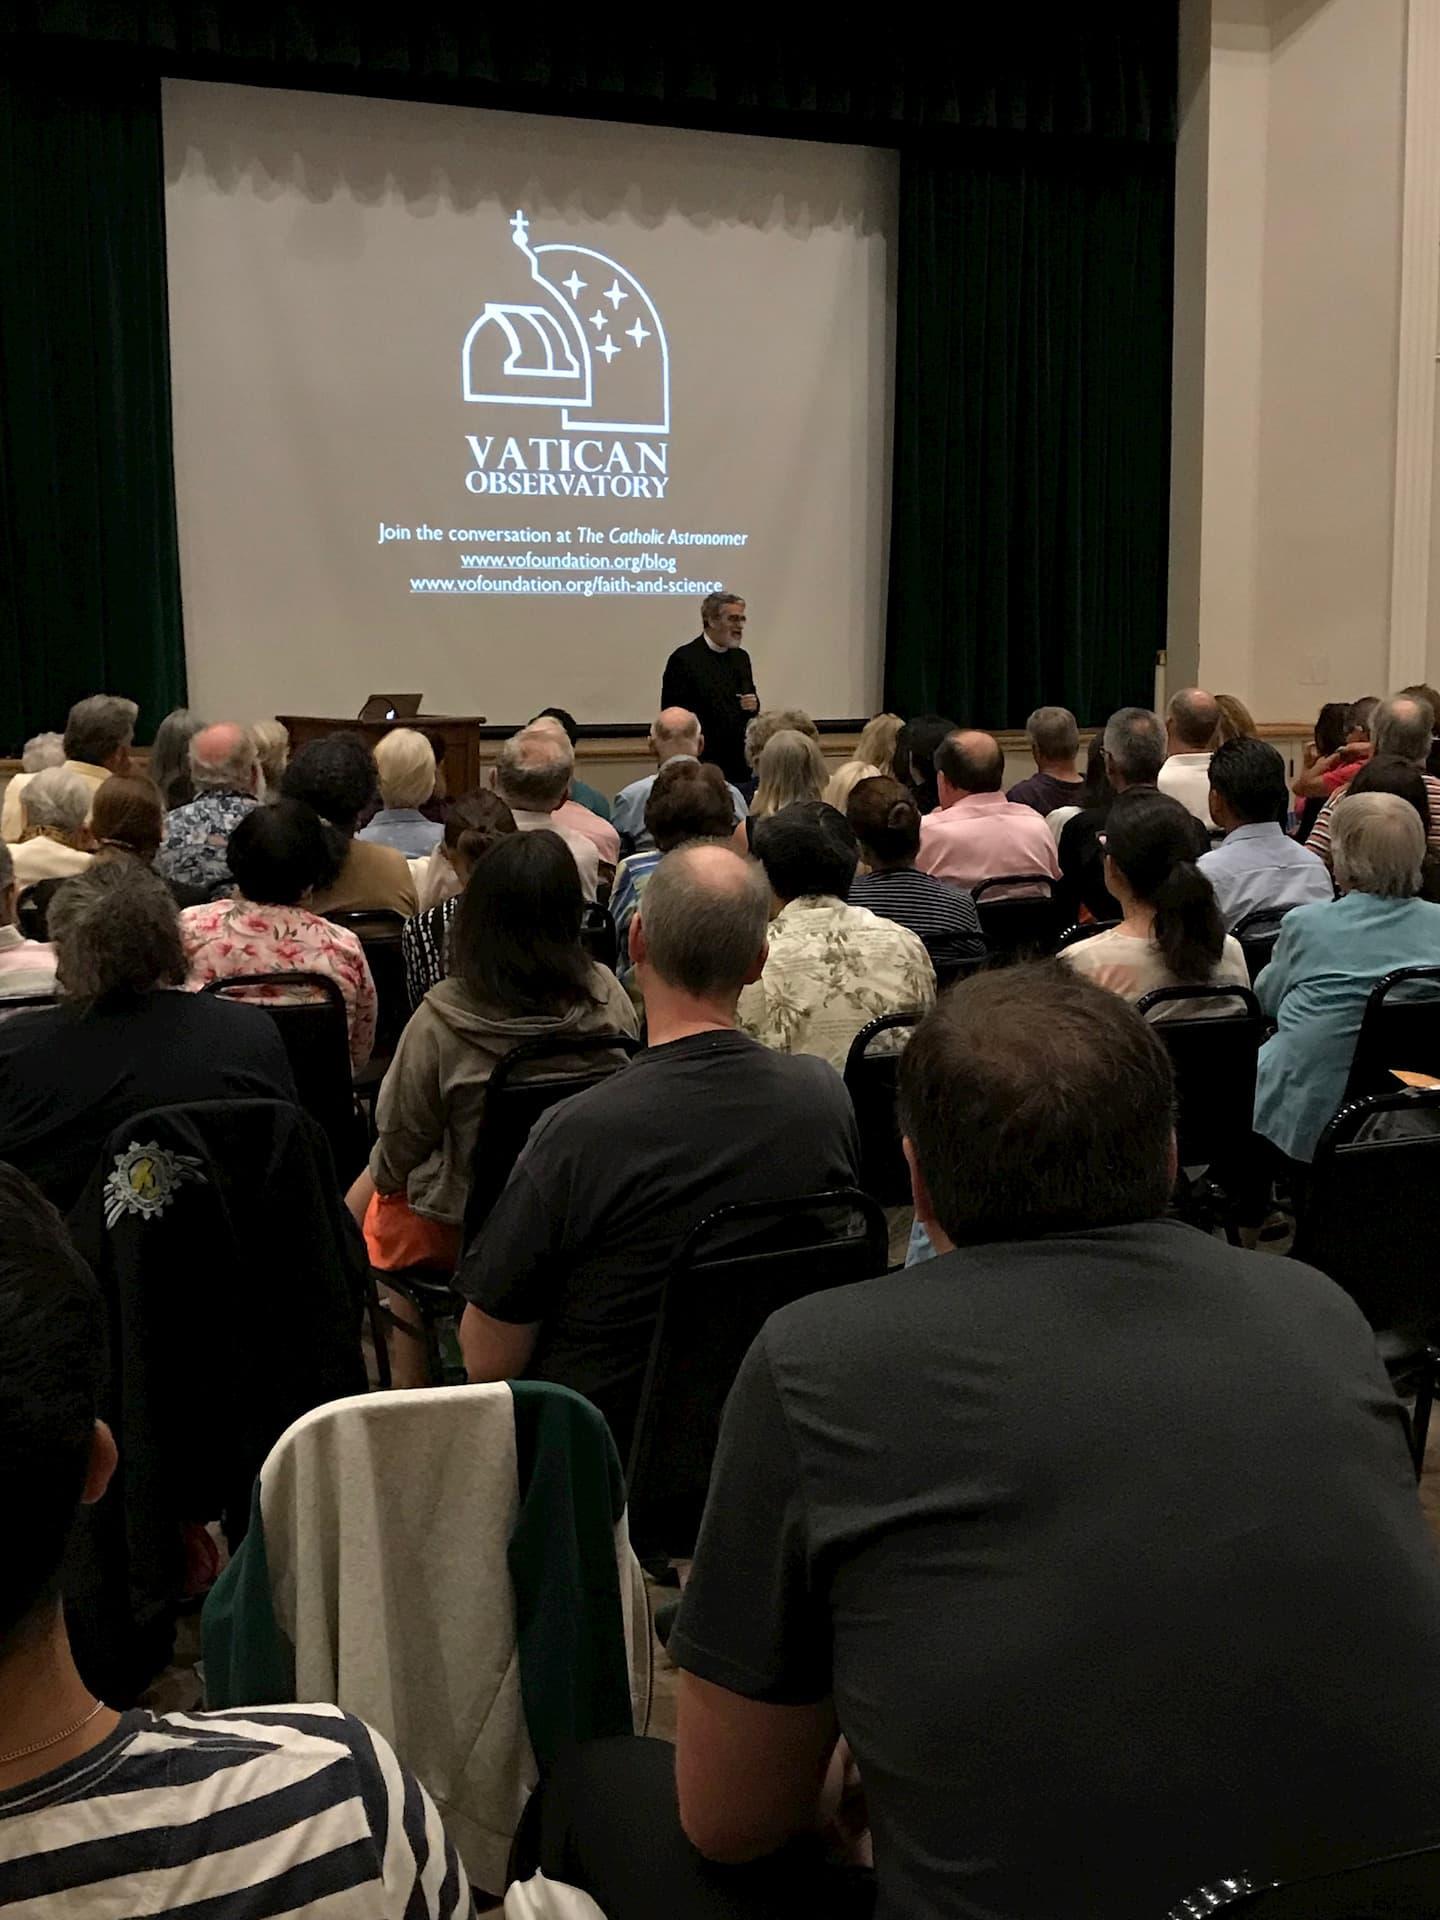 Br. Guy Consolmagno speaking at Holy Family Parish, South Pasadena, CA